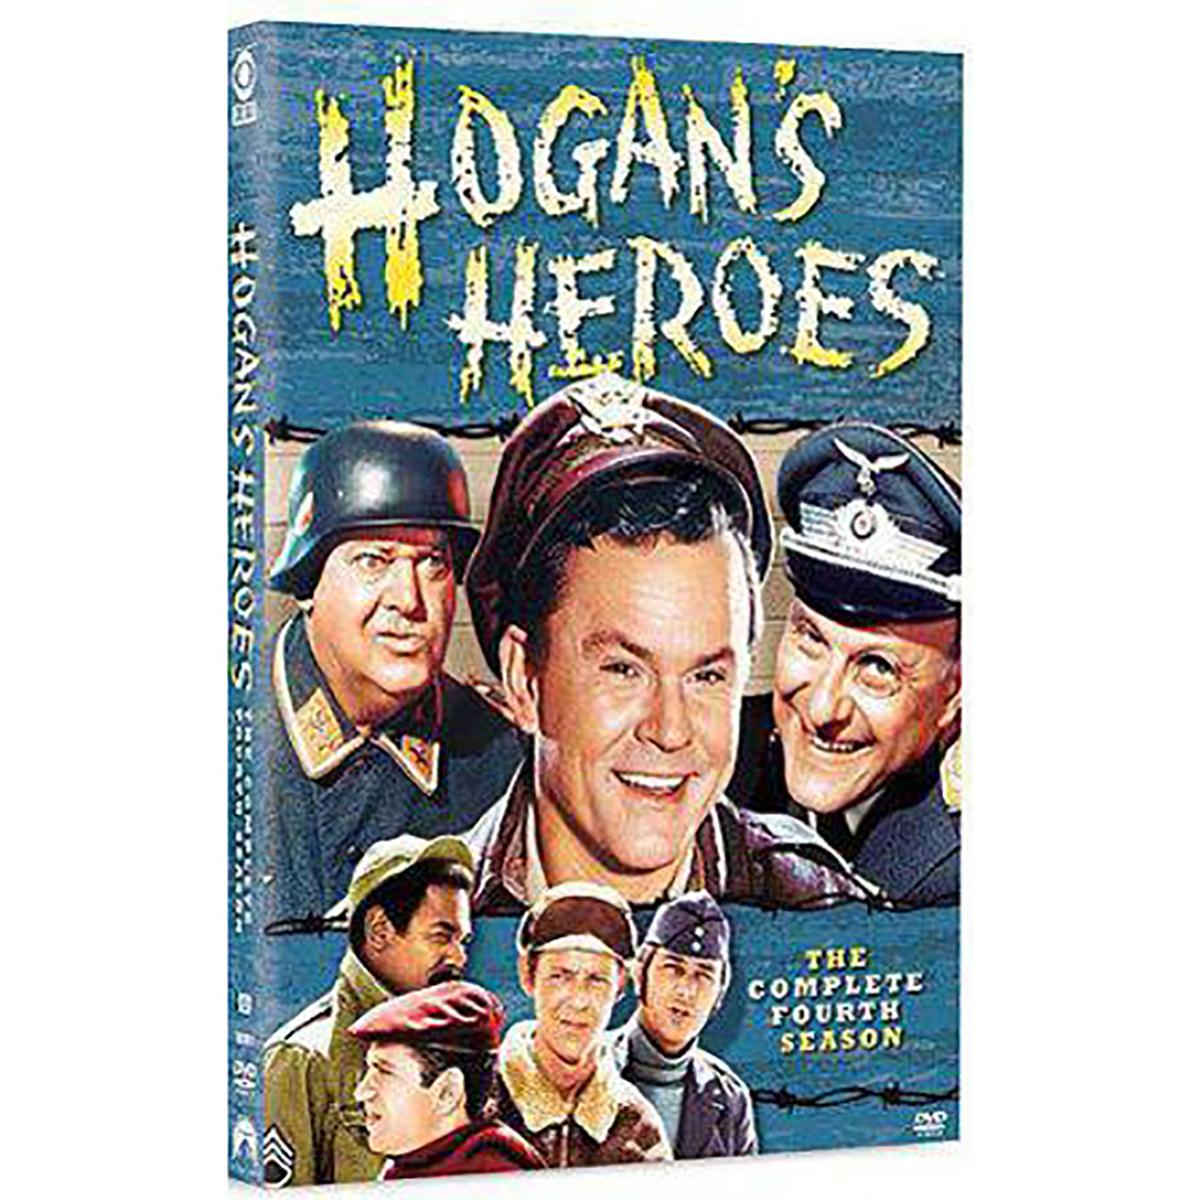 Hogan's Heroes: Season 4 DVD